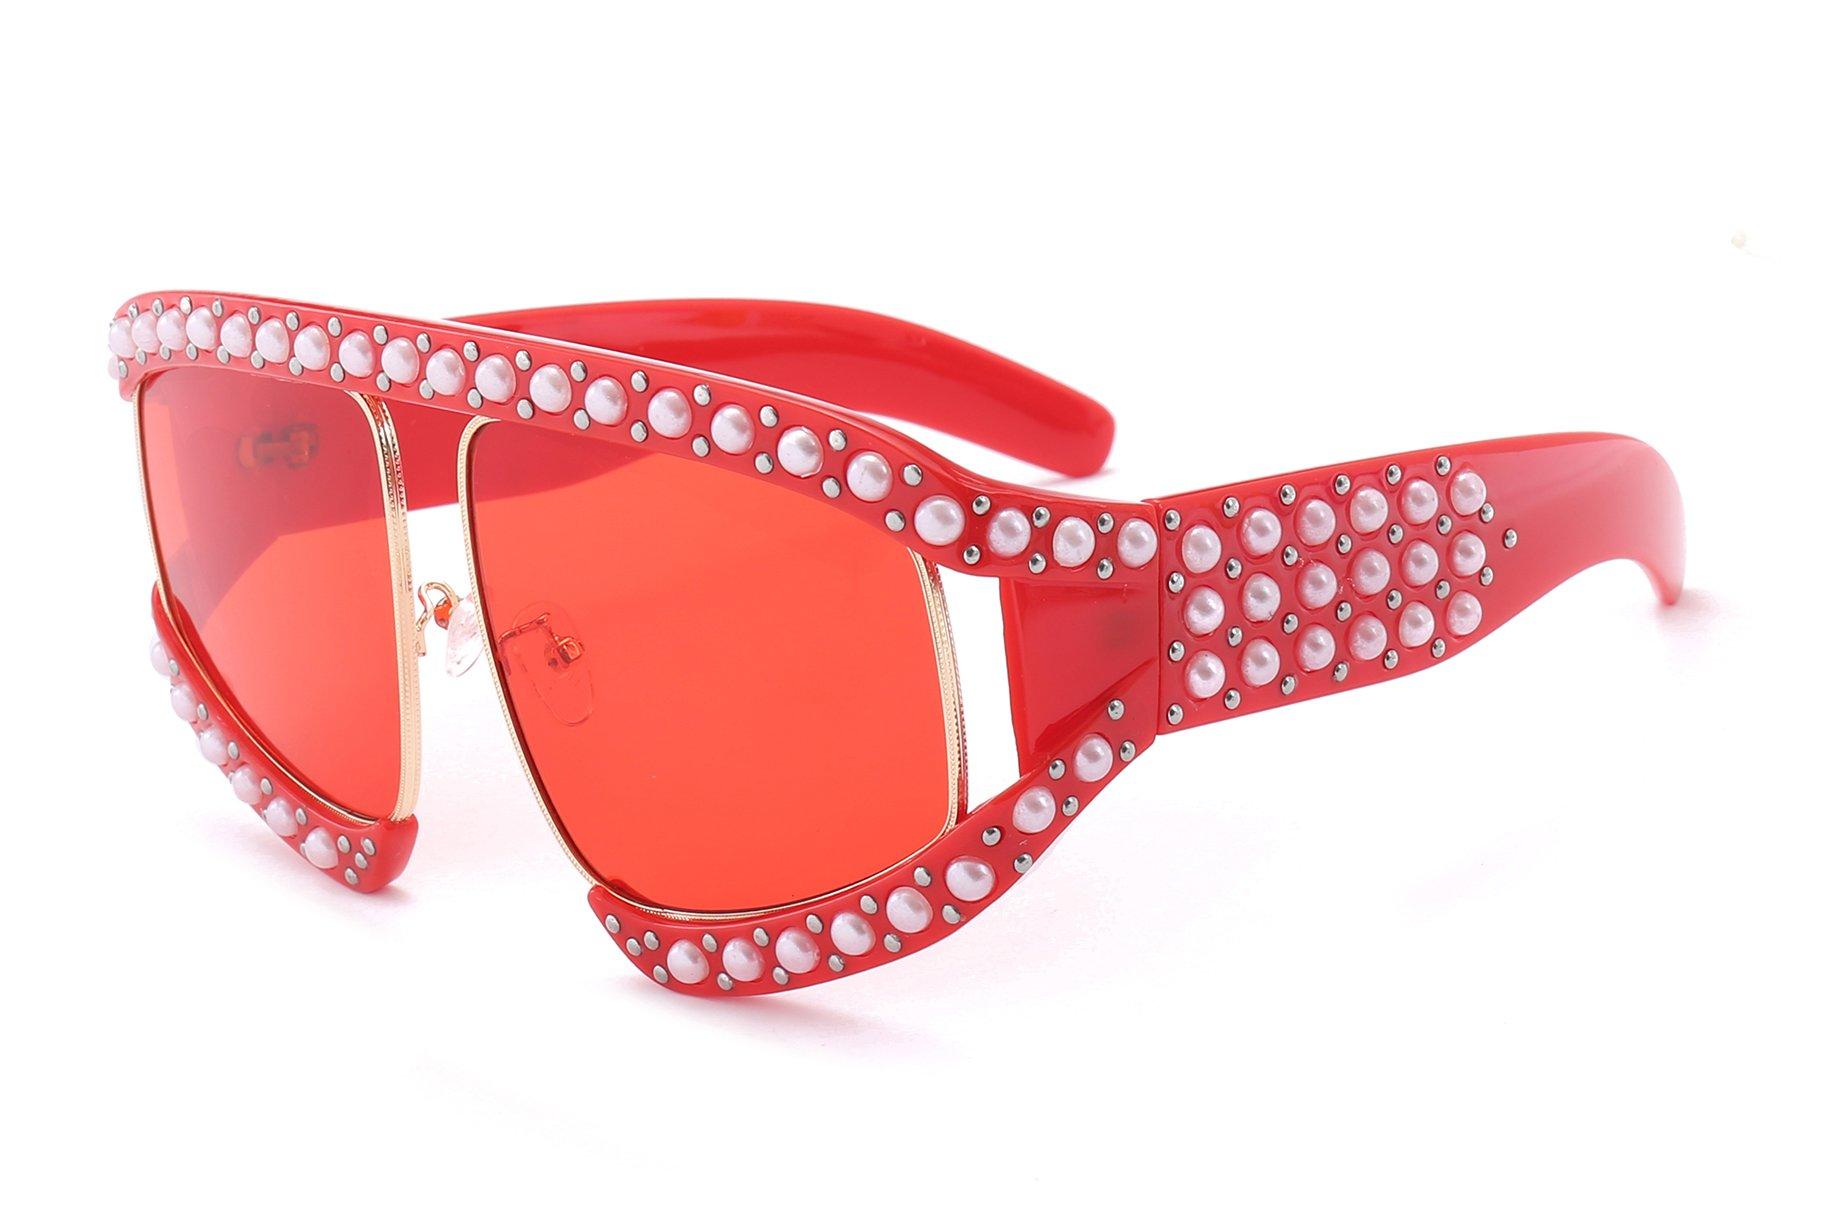 FEISEDY Stylish Oversize Beaded Women Sunglasses Inspired Brand Design B2420